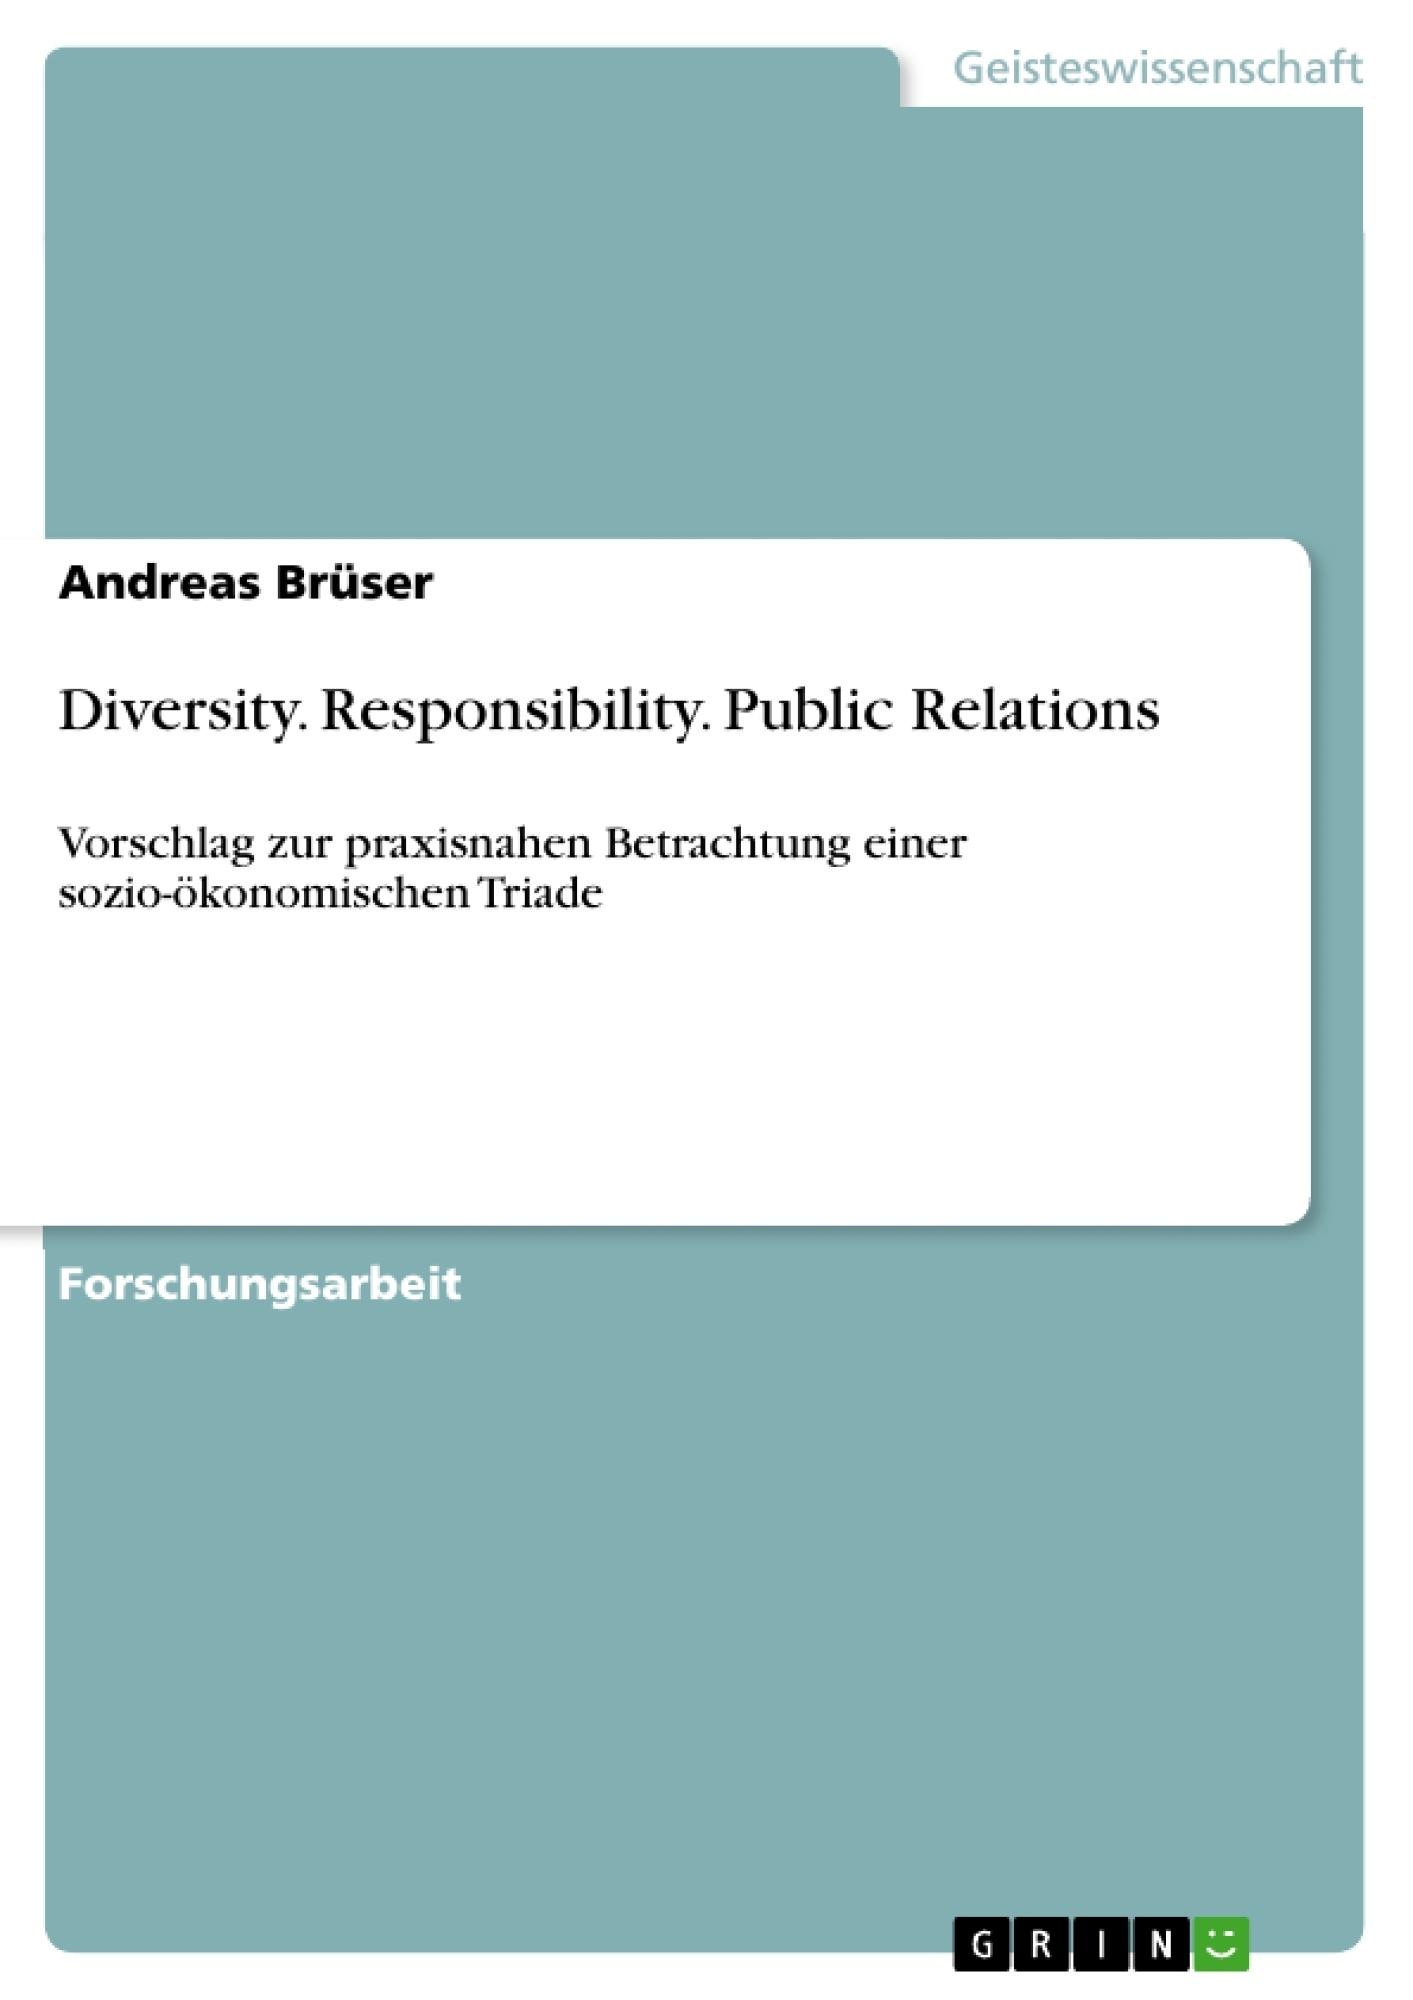 Titel: Diversity. Responsibility. Public Relations